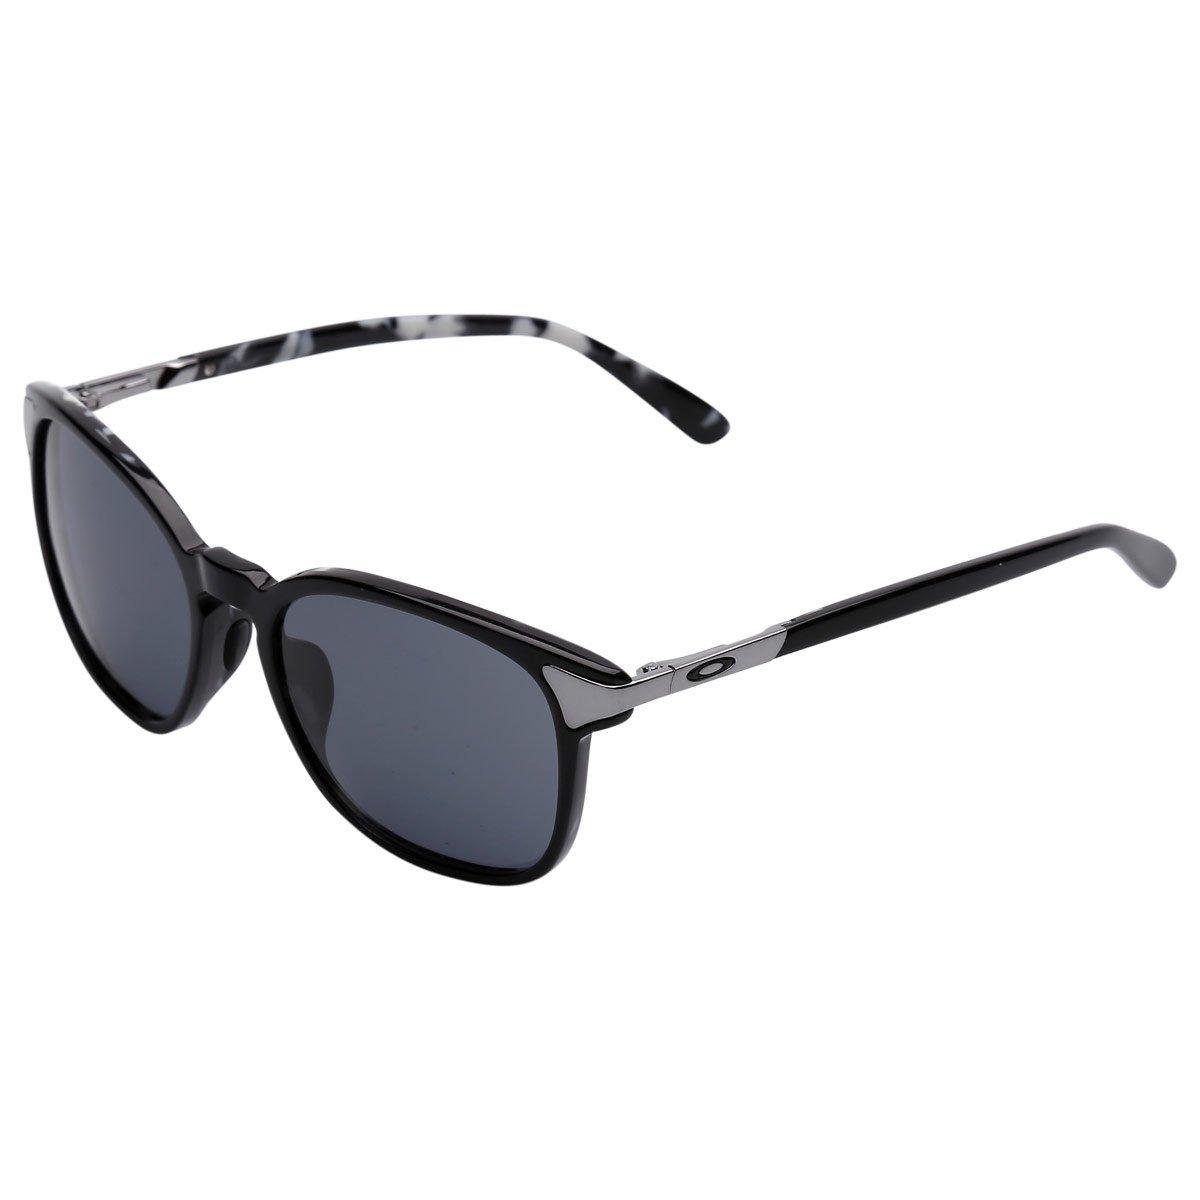 fa533274f1103 Óculos Oakley Ringer - Compre Agora